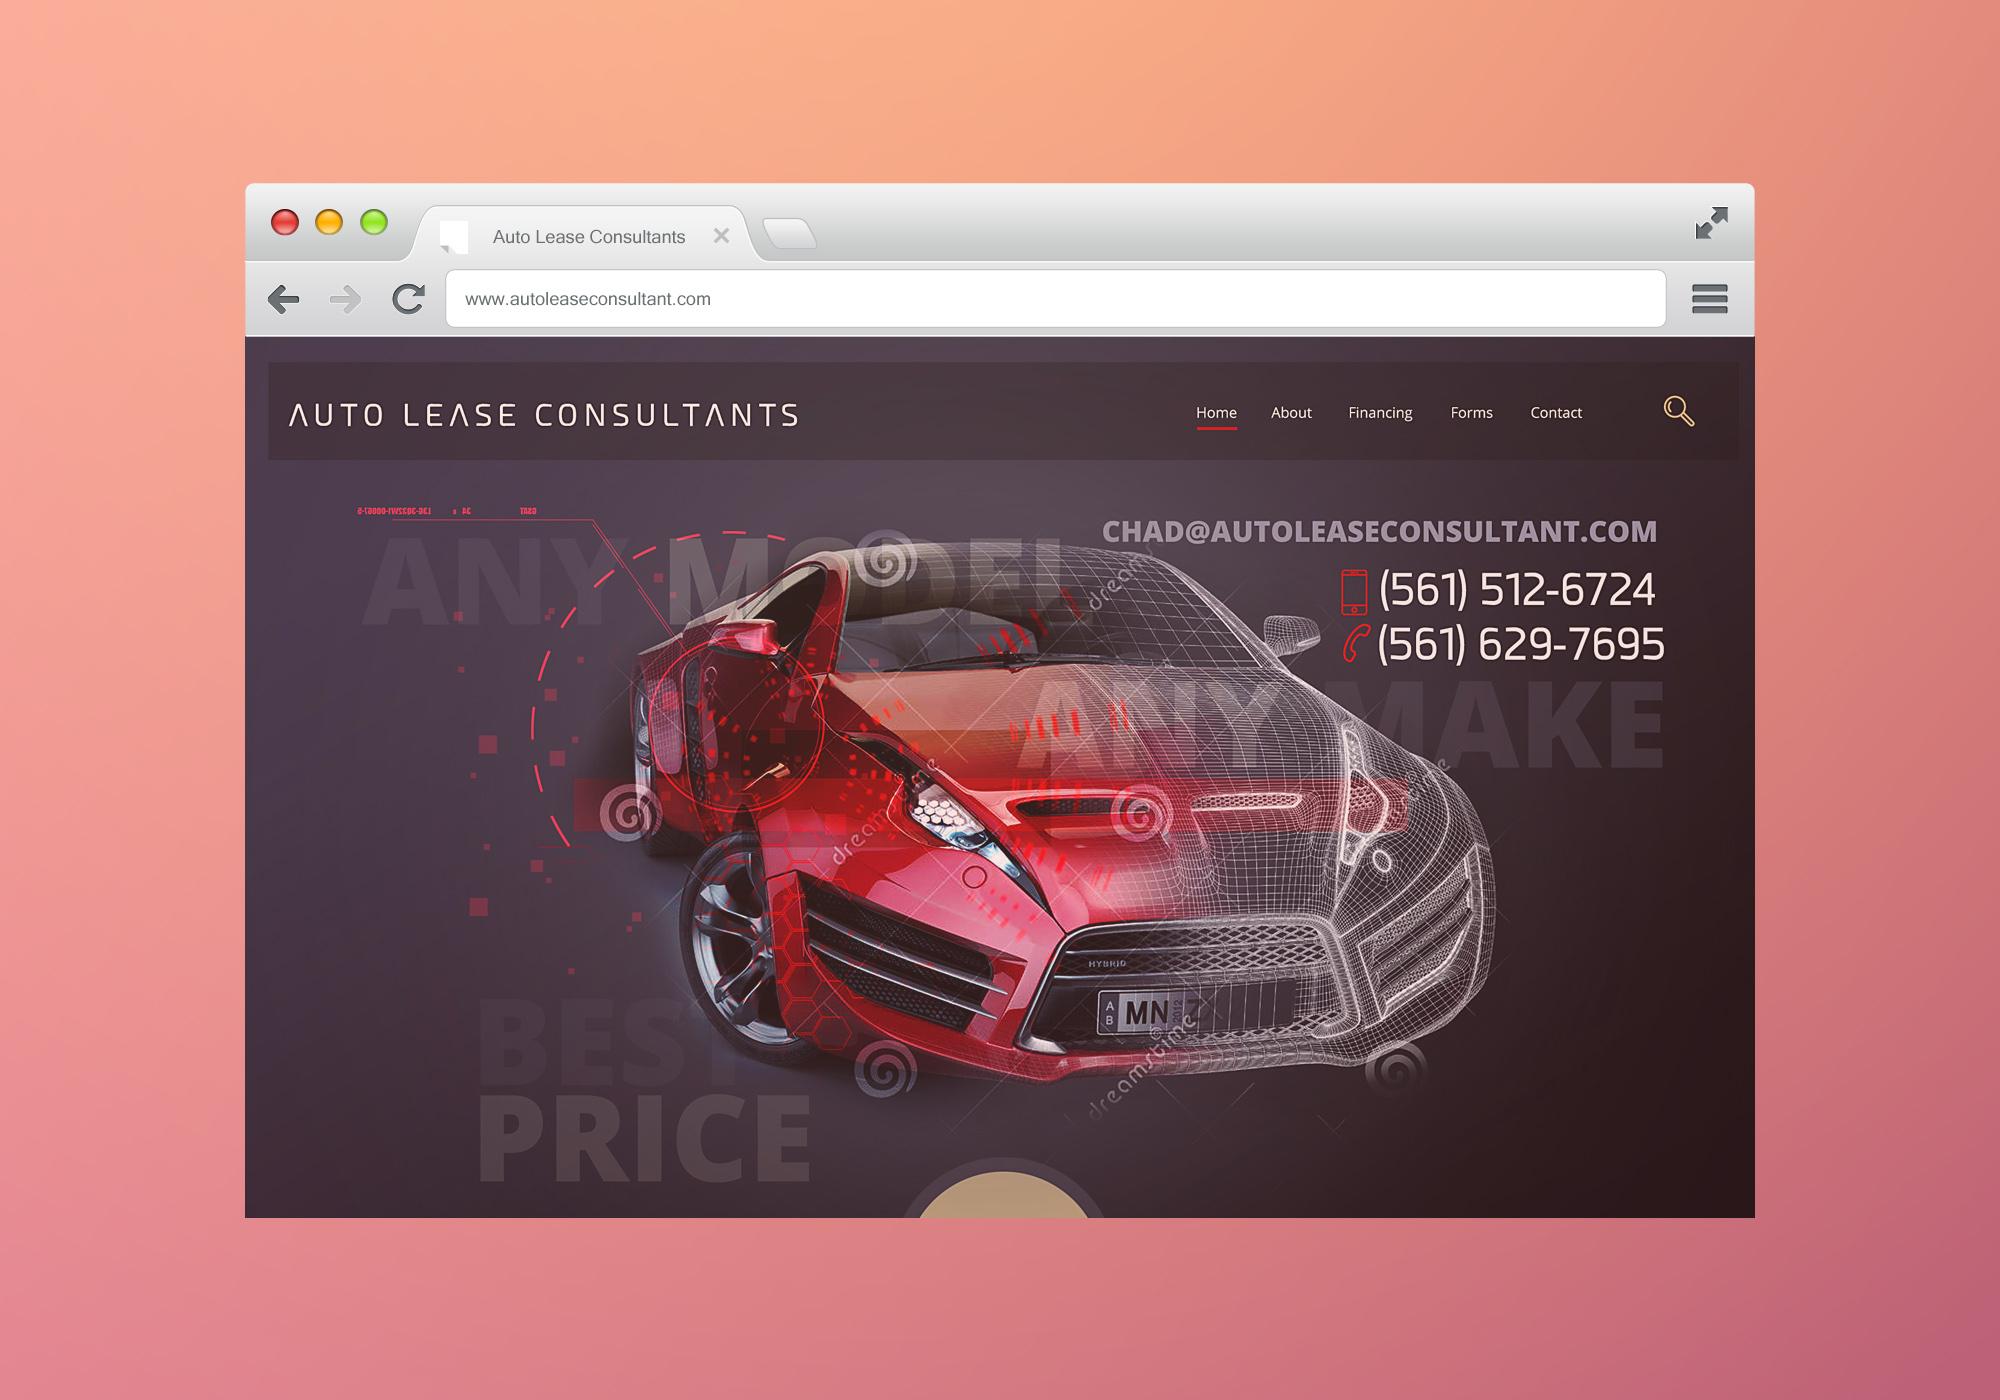 Auto Lease Consultant Website Design, Branding and Development